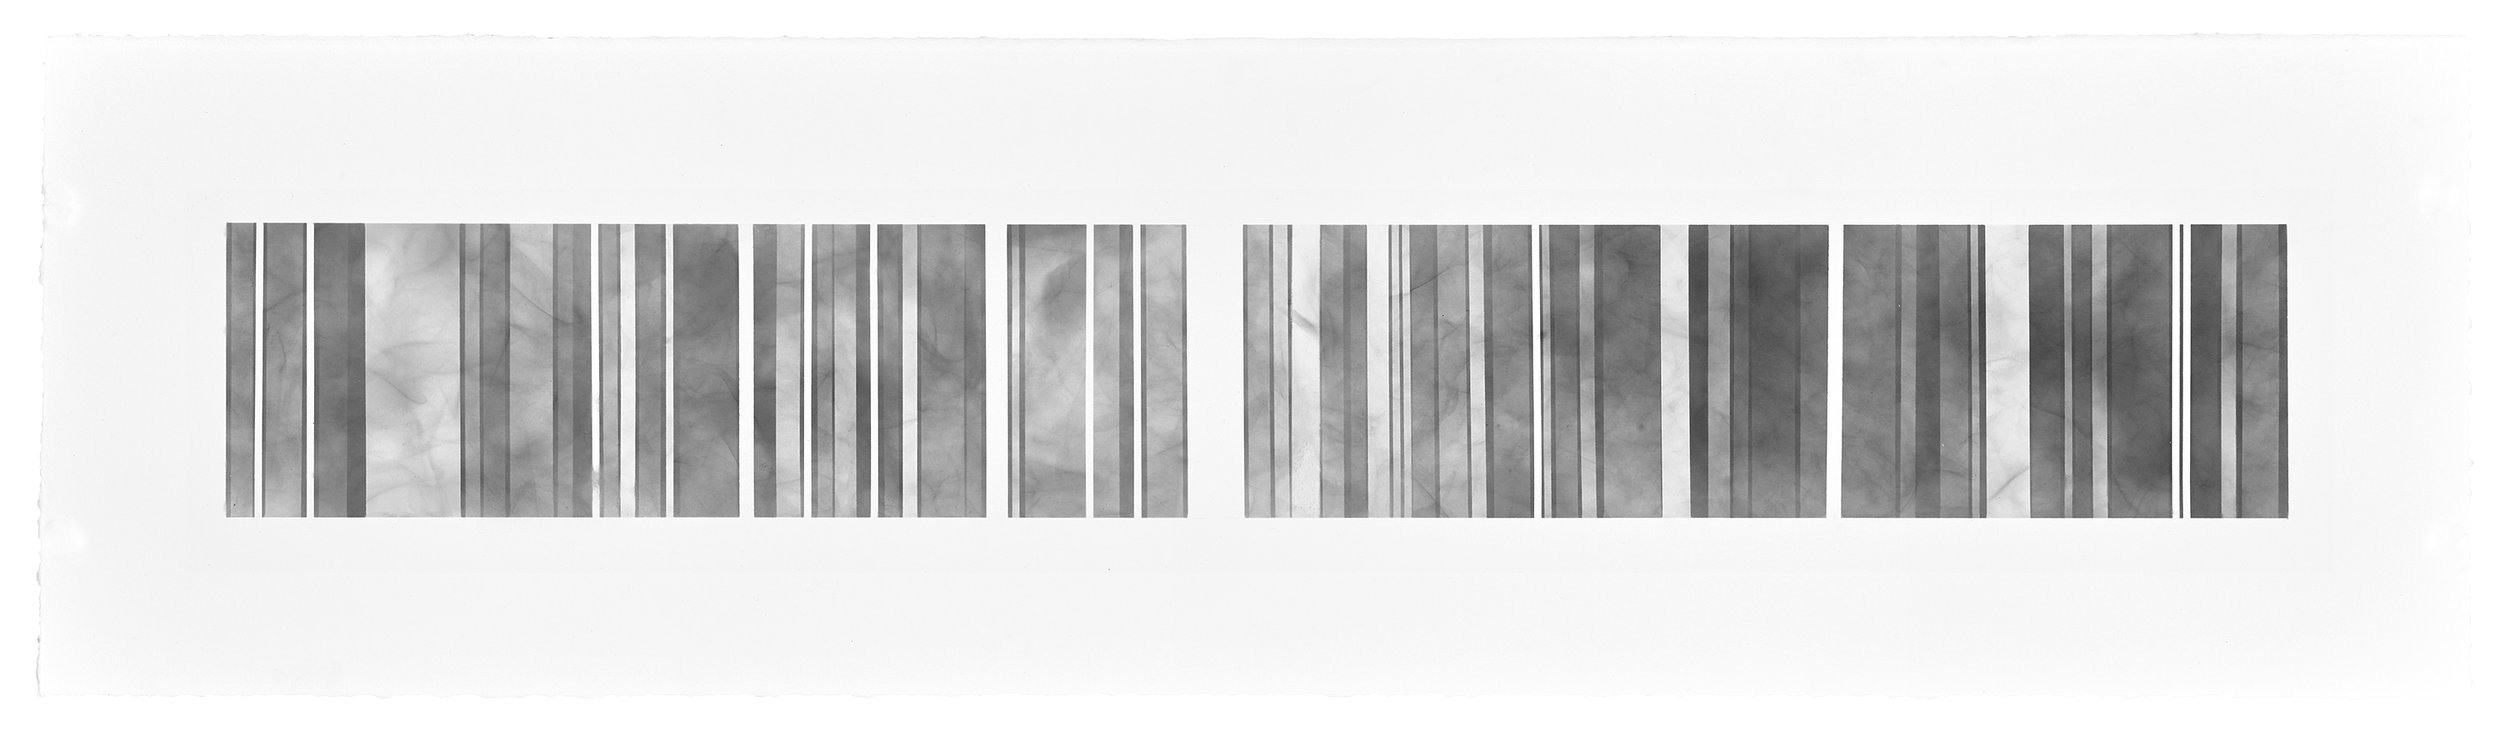 Barcode Series D, 8, 2018 copy.jpg